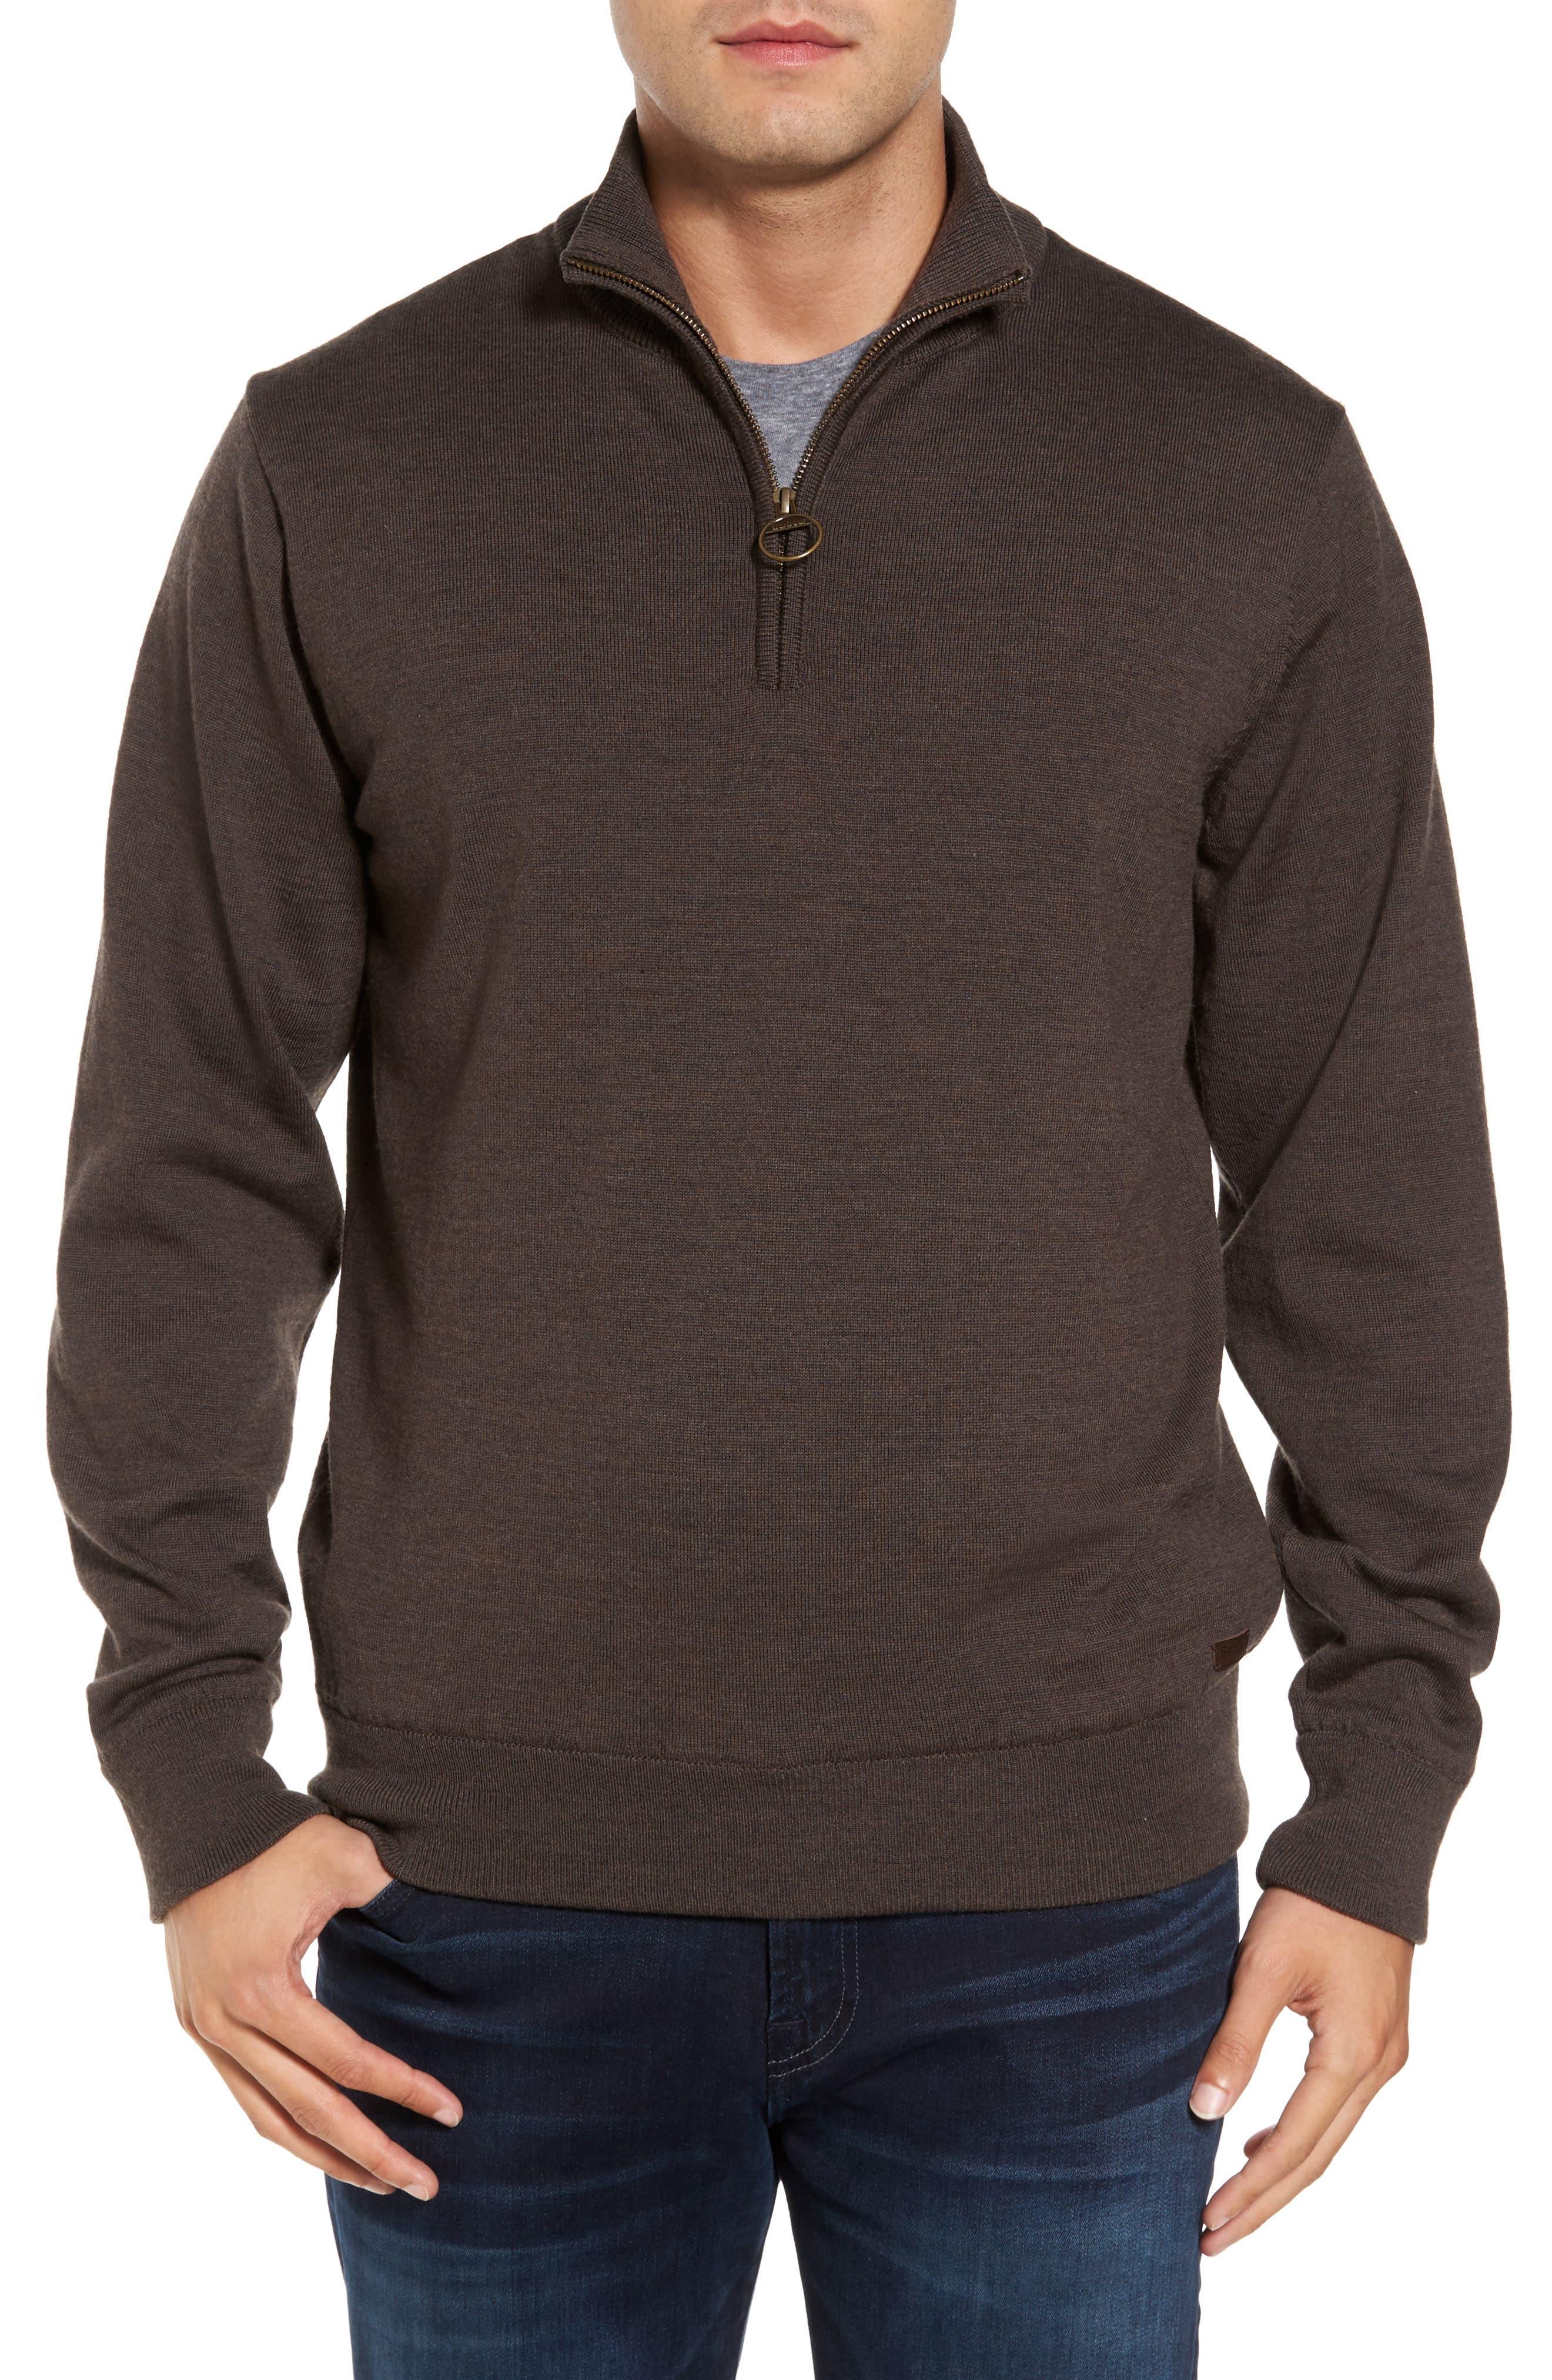 Main Image - Barbour Gamlin Quarter Zip Wool Pullover